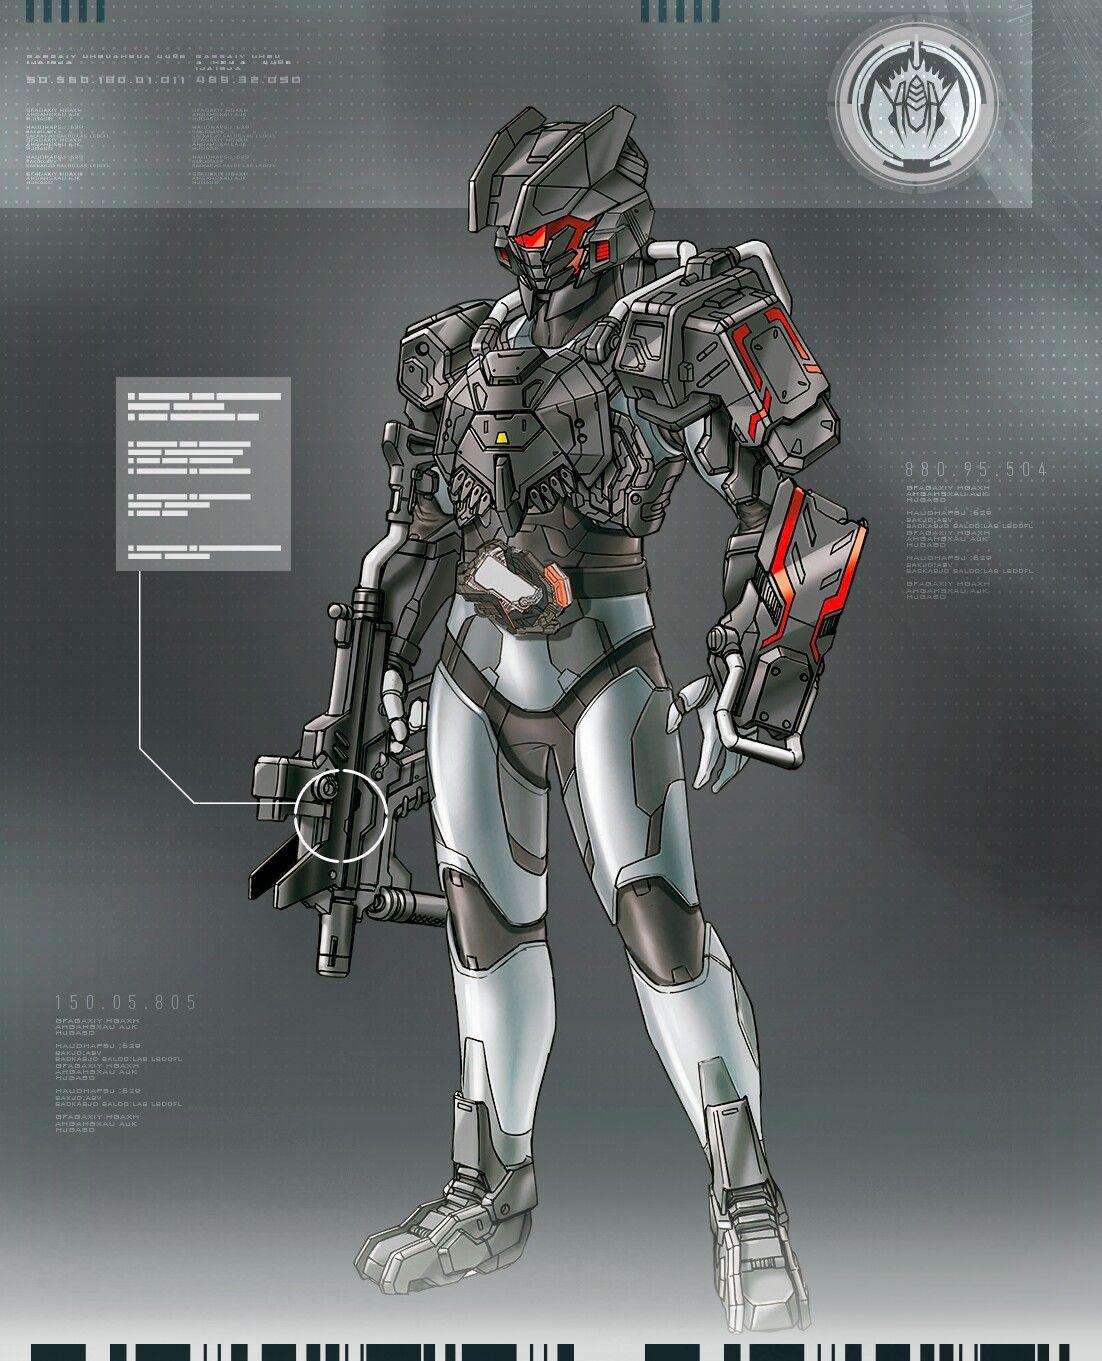 Invading Horseshoe Crab Raider Kamen Rider Decade Kamen Rider Zi O Kamen Rider Kabuto